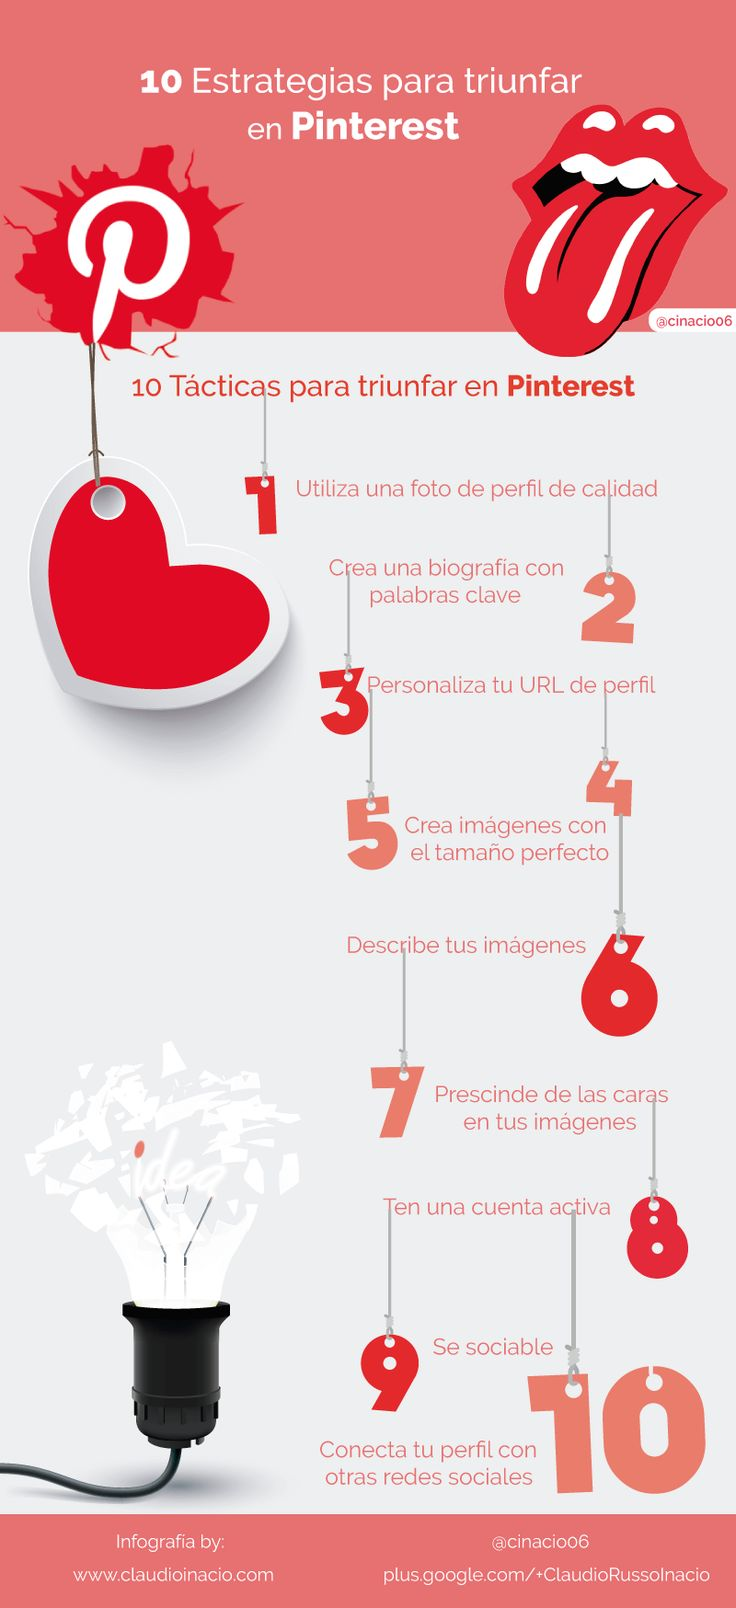 10 Estrategias para triunfar con tu perfil Pinterest #SocialMedia #Pinterest